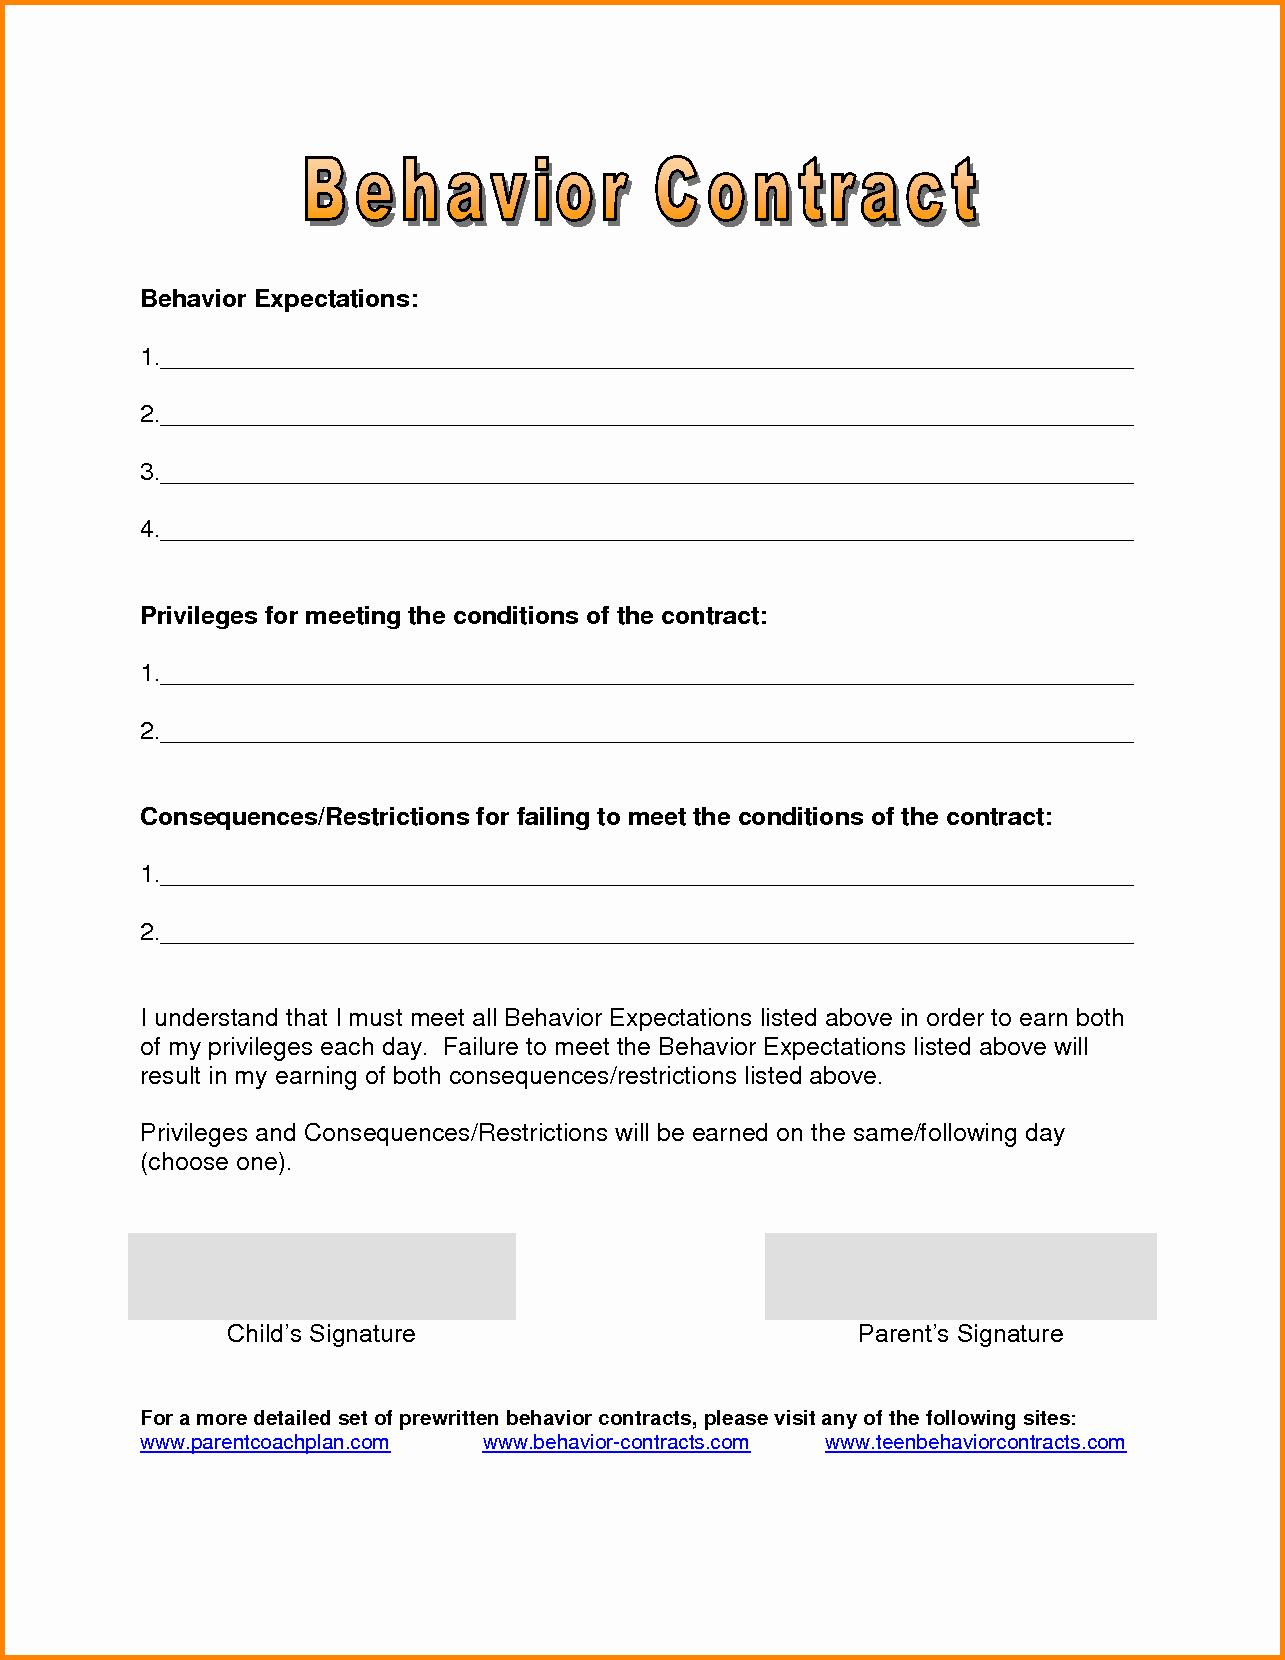 Behavior Contract Template Mental Health Elegant Contract Behavior Contract Template